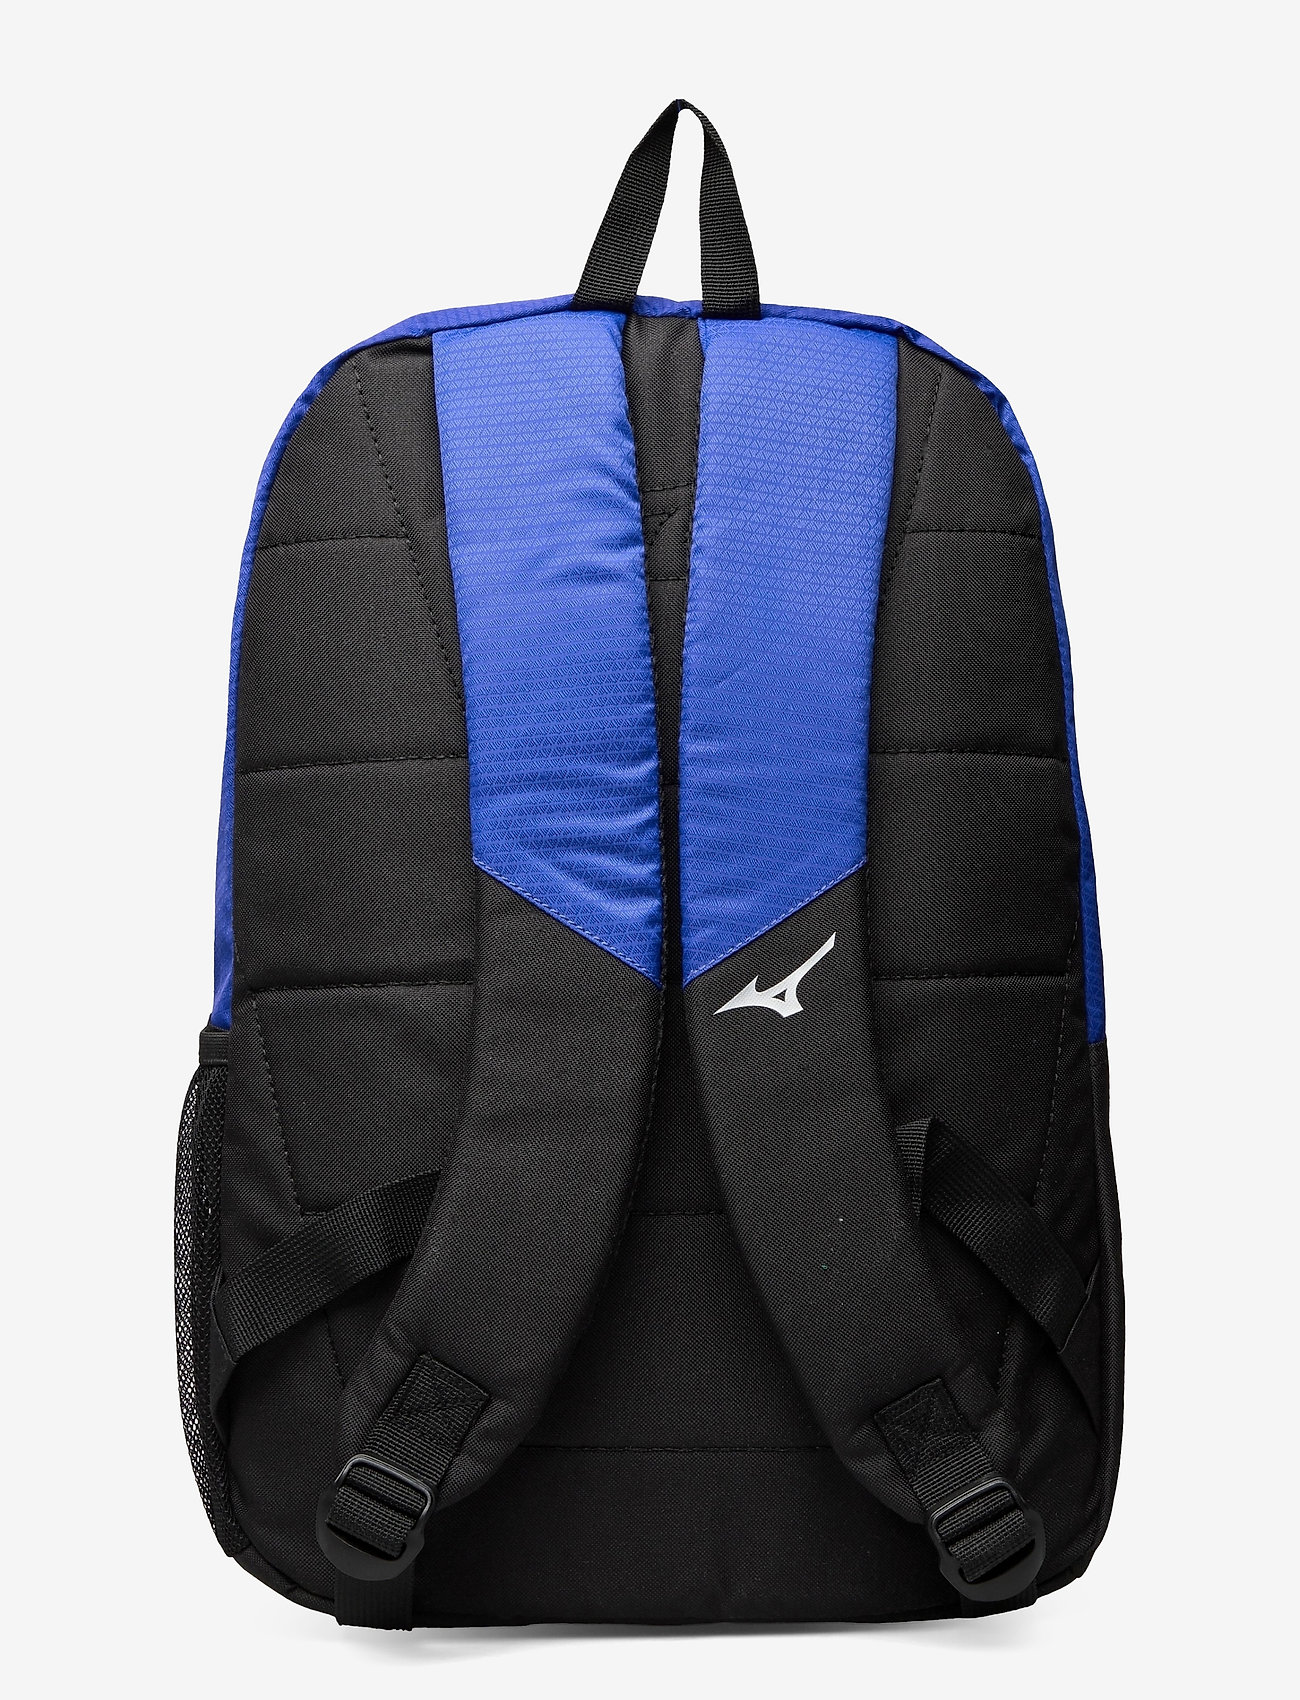 Mizuno - Backpack (20L) - sportstasker - blue - 1